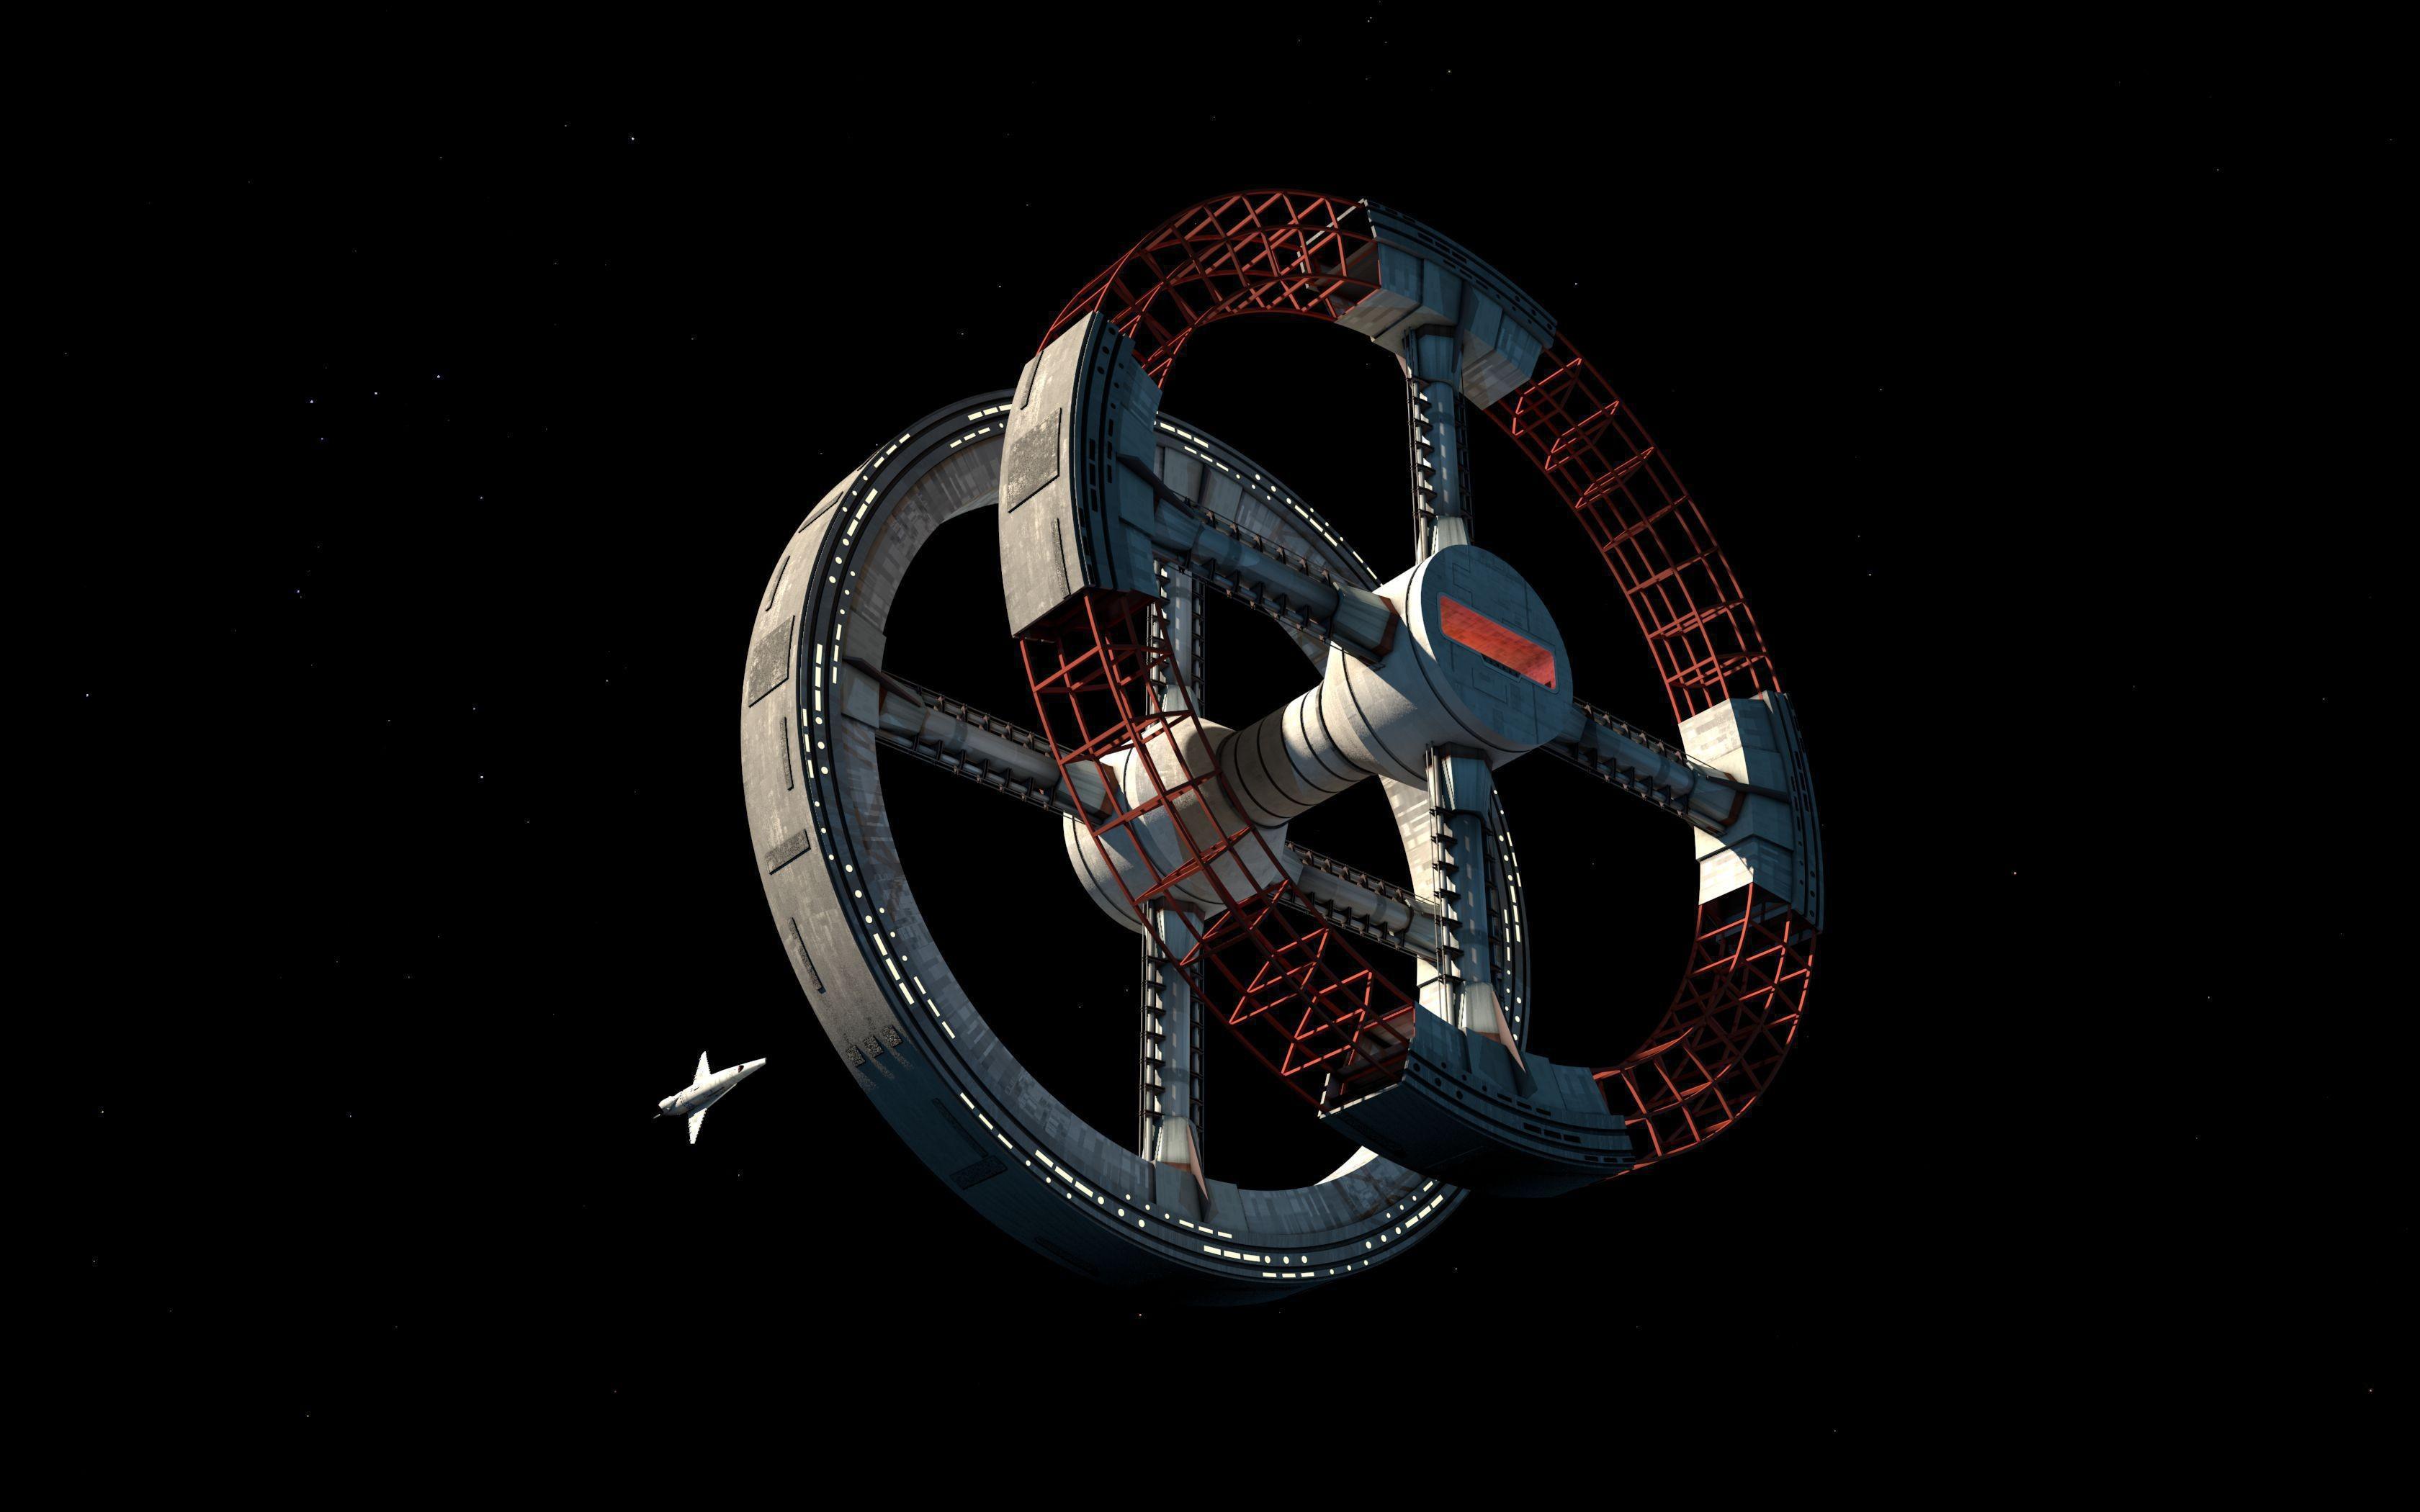 2001 a space odyssey wallpaper - Space odyssey wallpaper ...